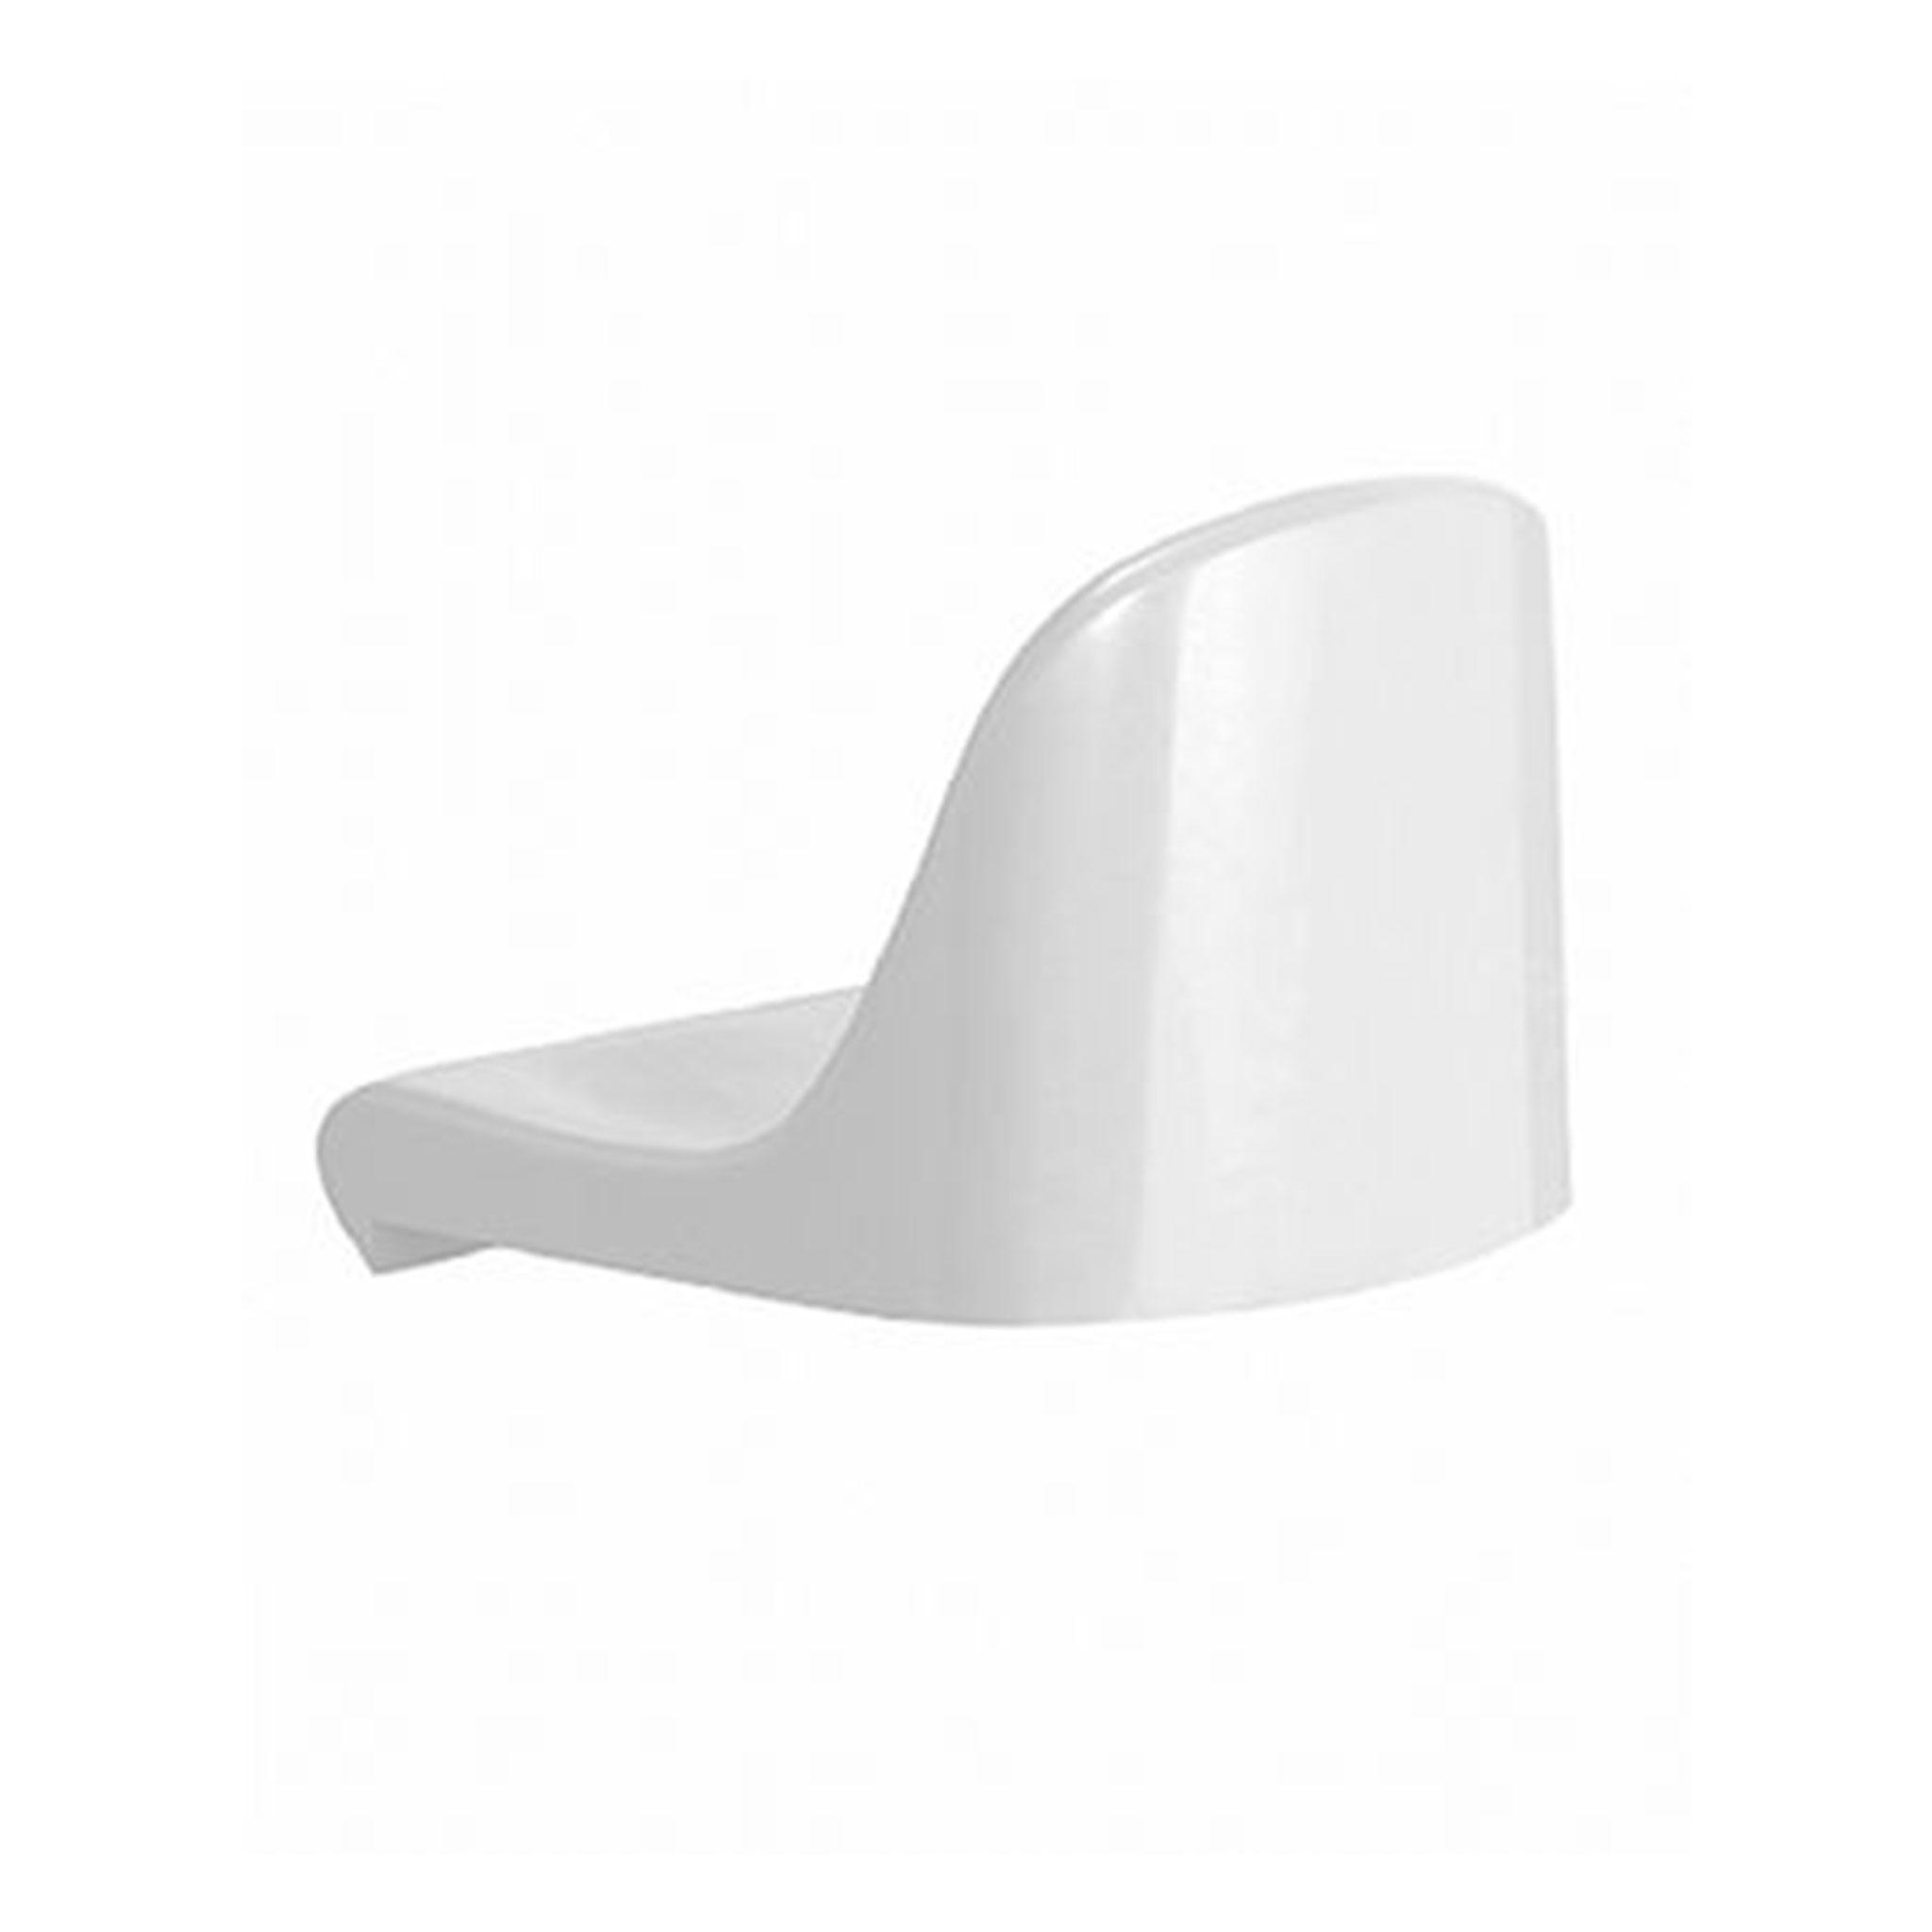 delta_backrest_monoblock_copolymer_pp_stadium_chair_seatorium_10